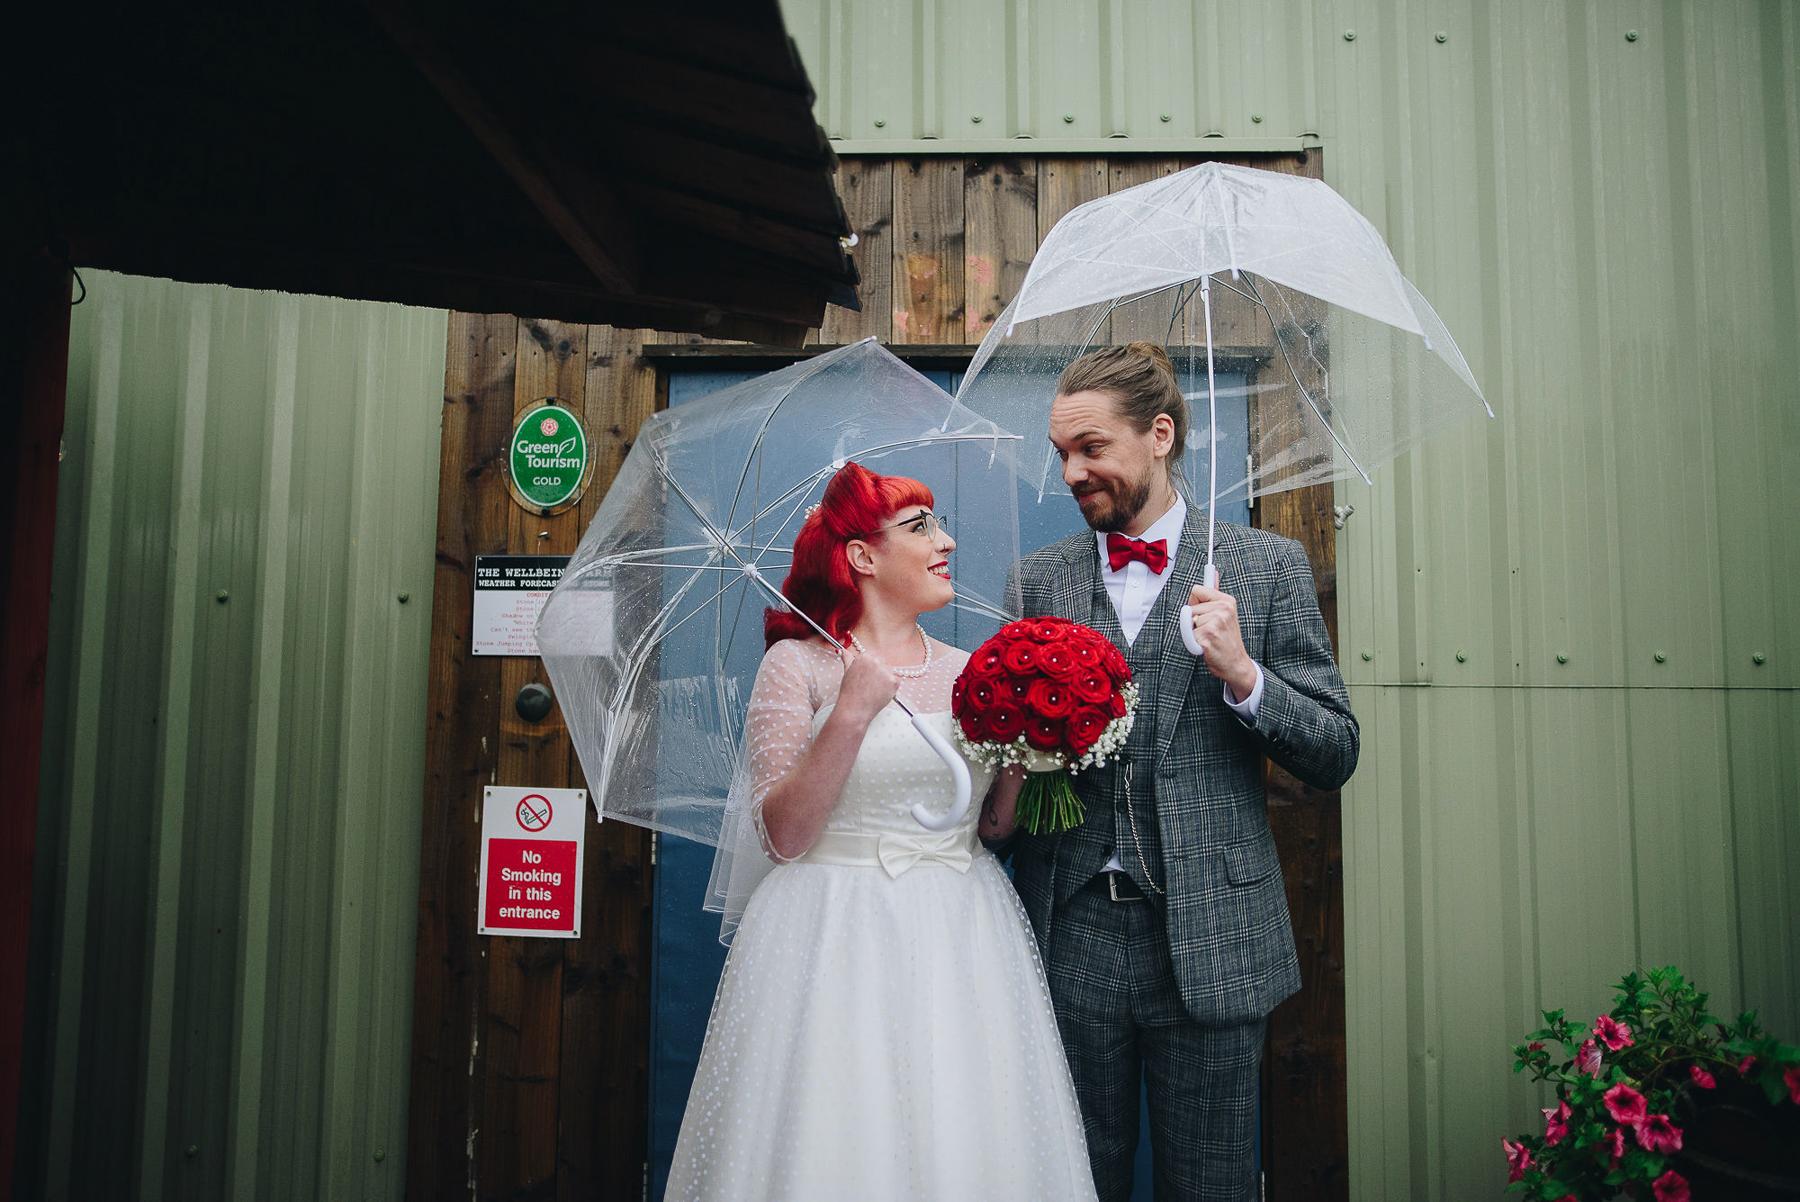 Wellbeing_Farm_Wedding_Photography_The_Pin-Up_Bride_Lara_Shaun-75.jpg